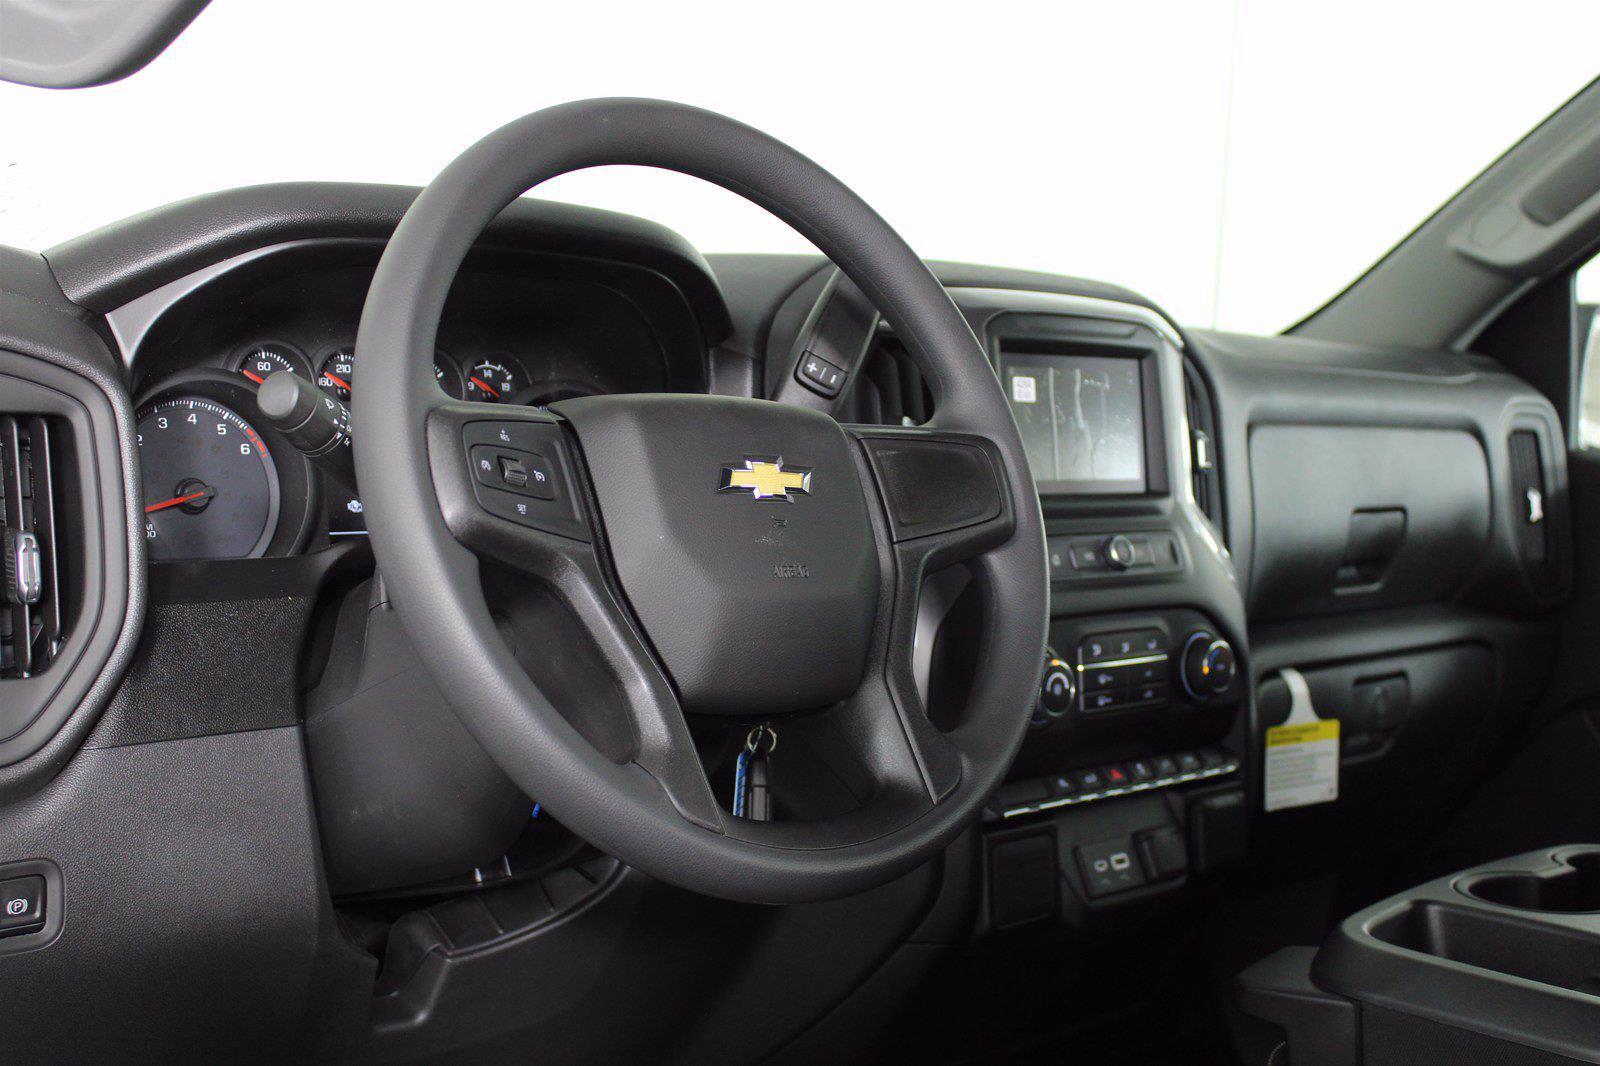 2021 Chevrolet Silverado 1500 Regular Cab 4x2, Pickup #D110918 - photo 10